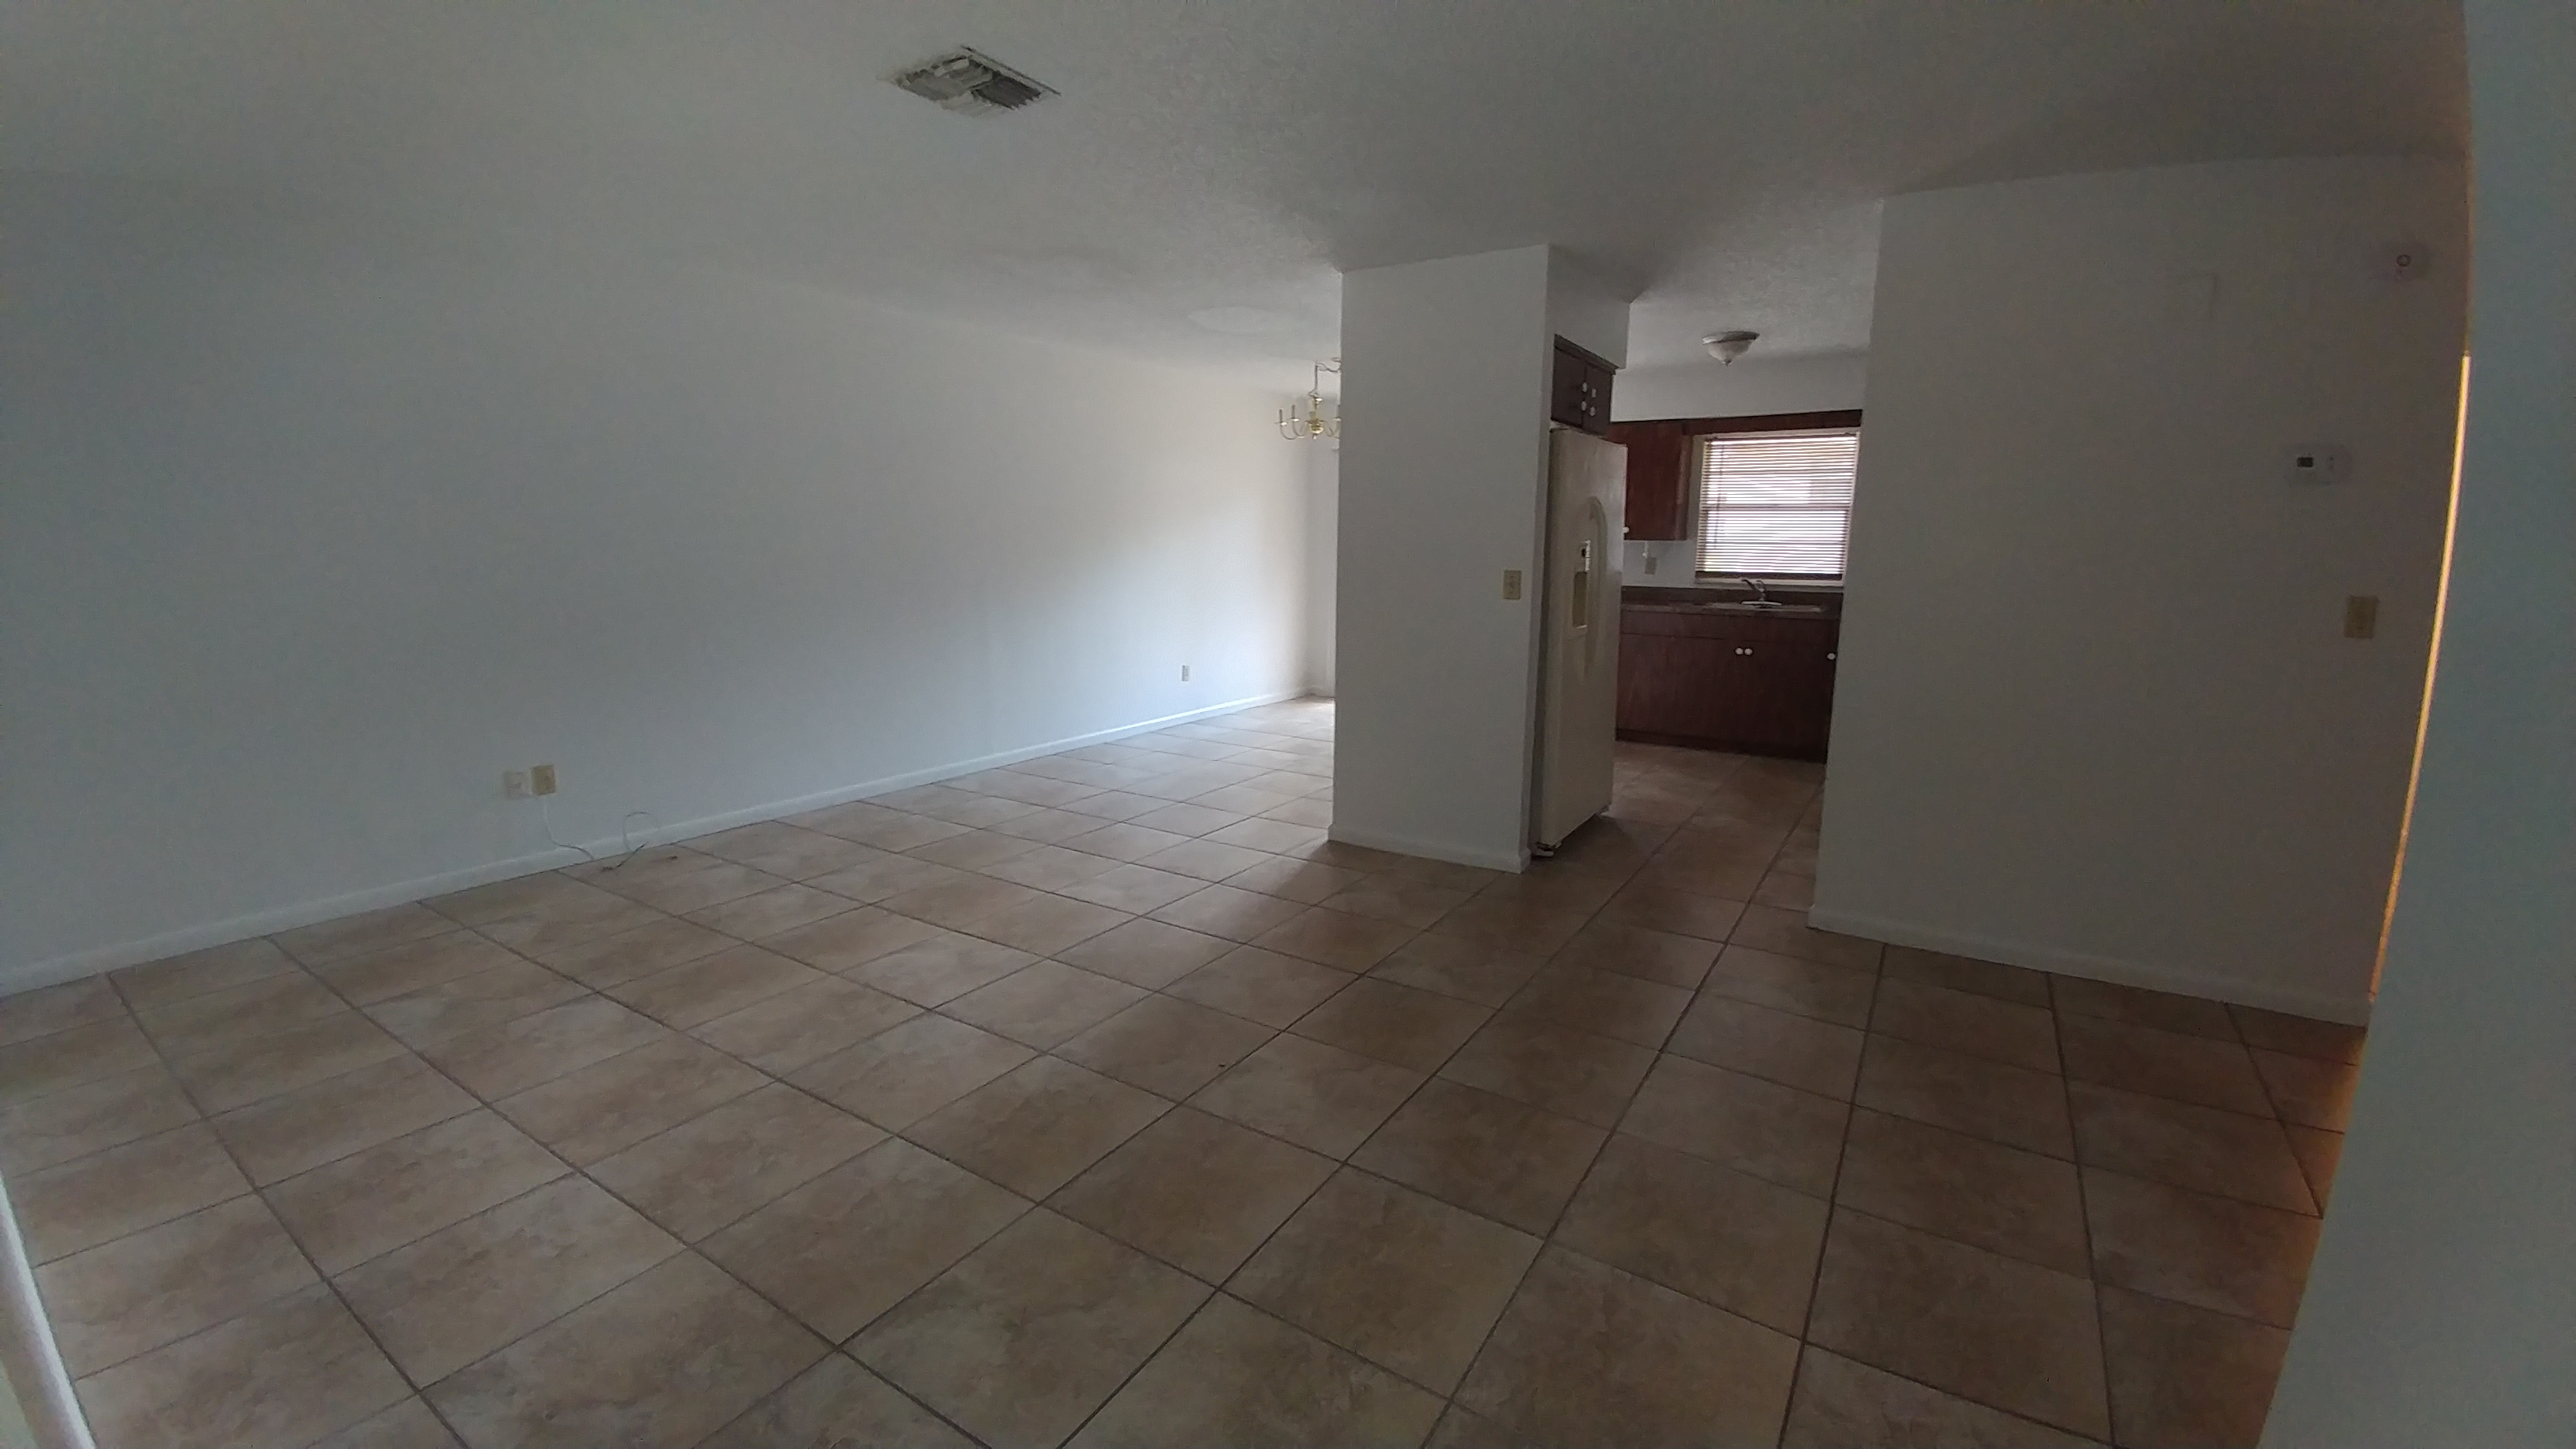 3360 Ne 58th Ave, Silver Springs | Rental Listings | Avail